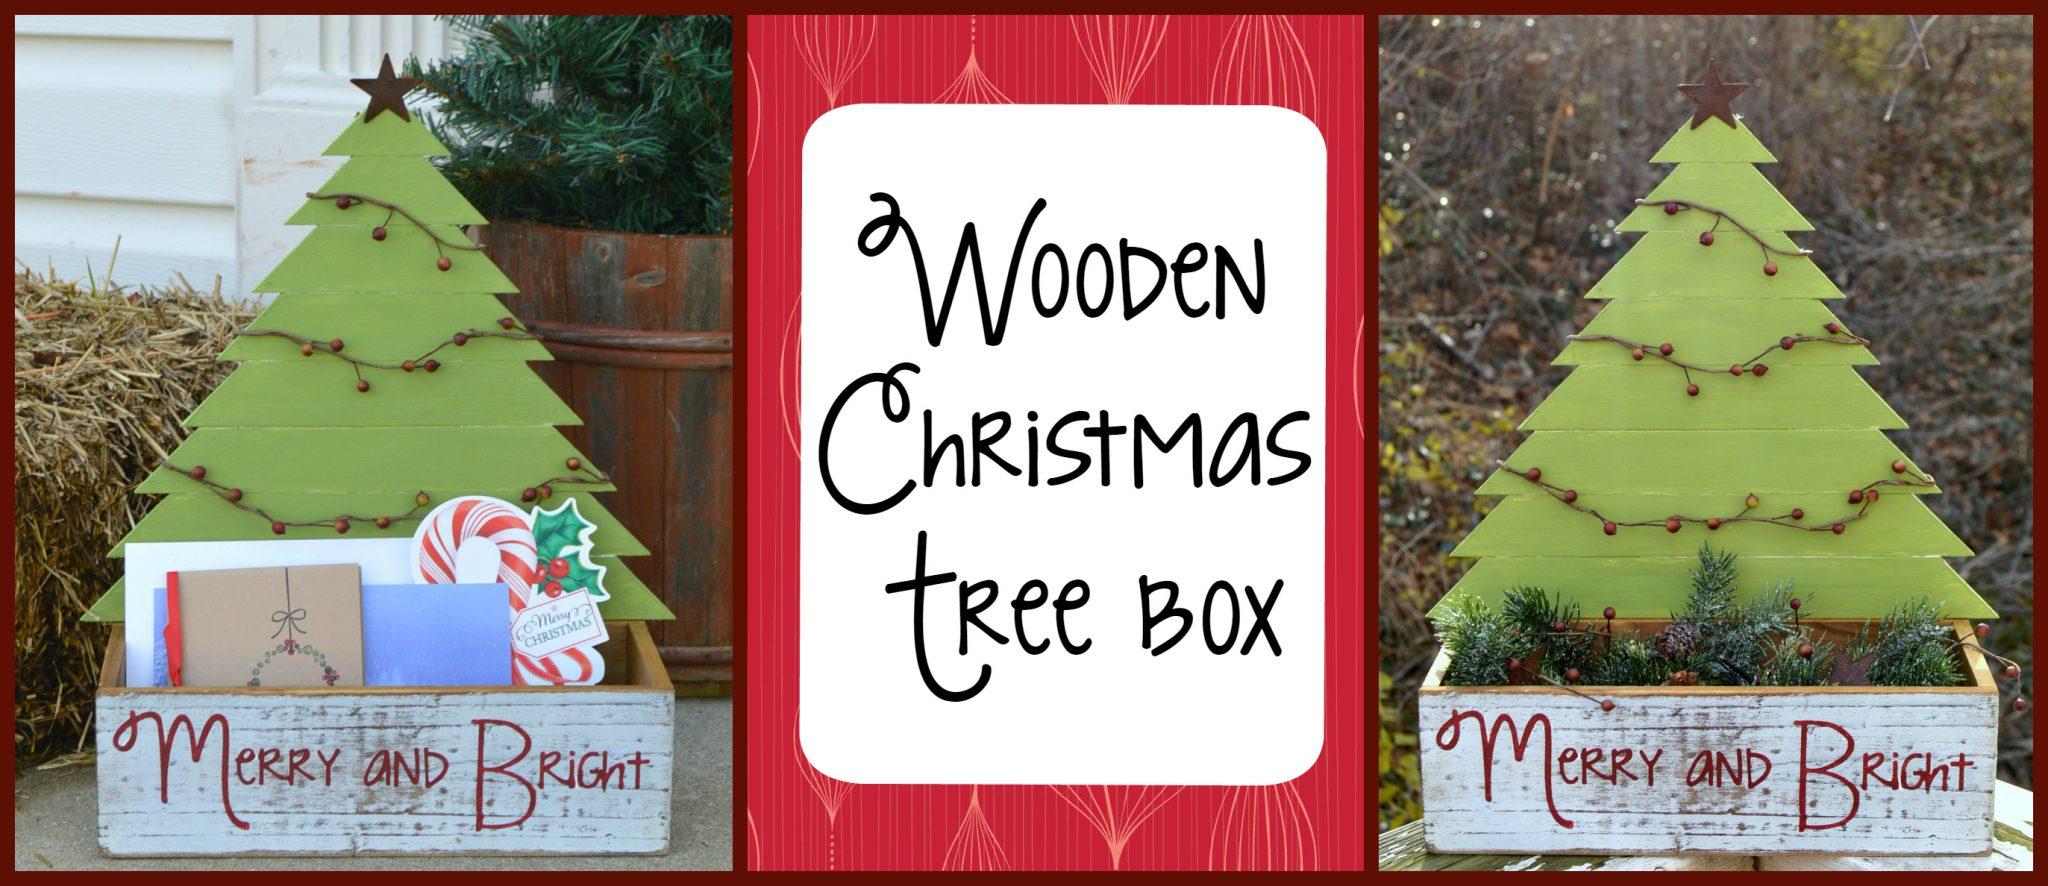 christmastreeboxpin2 - Christmas Tree Box